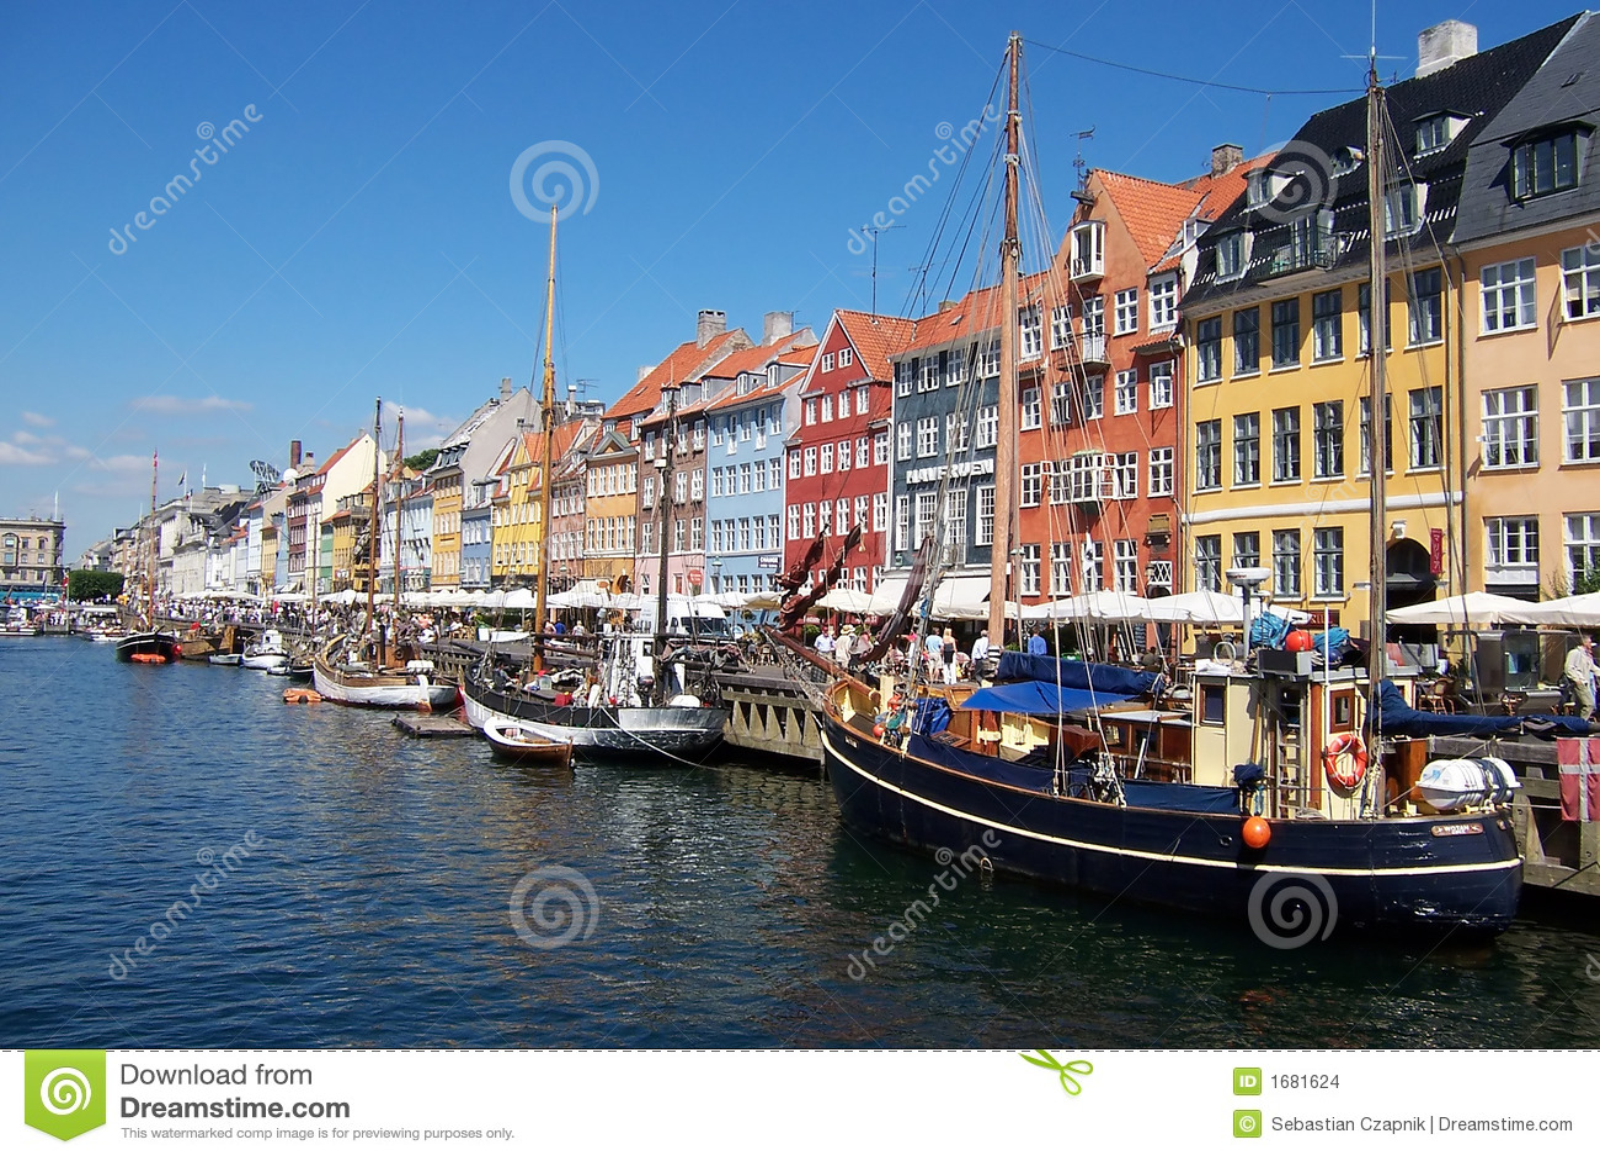 Kopenhagen-Kanal, Boote.